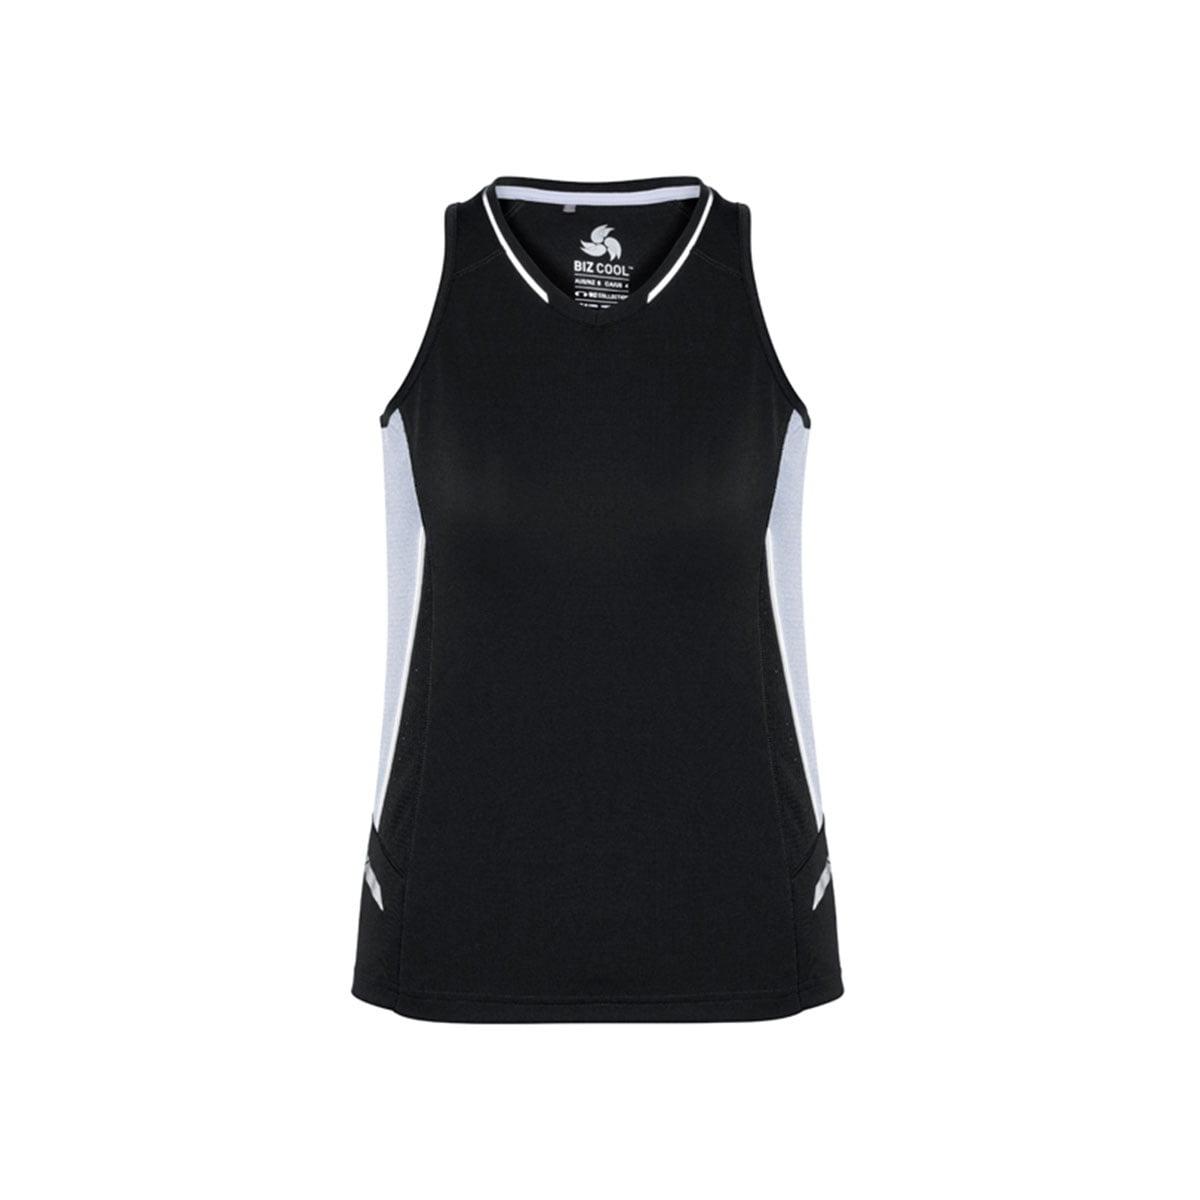 Ladies Renegade Singlet-Black / White / Silver